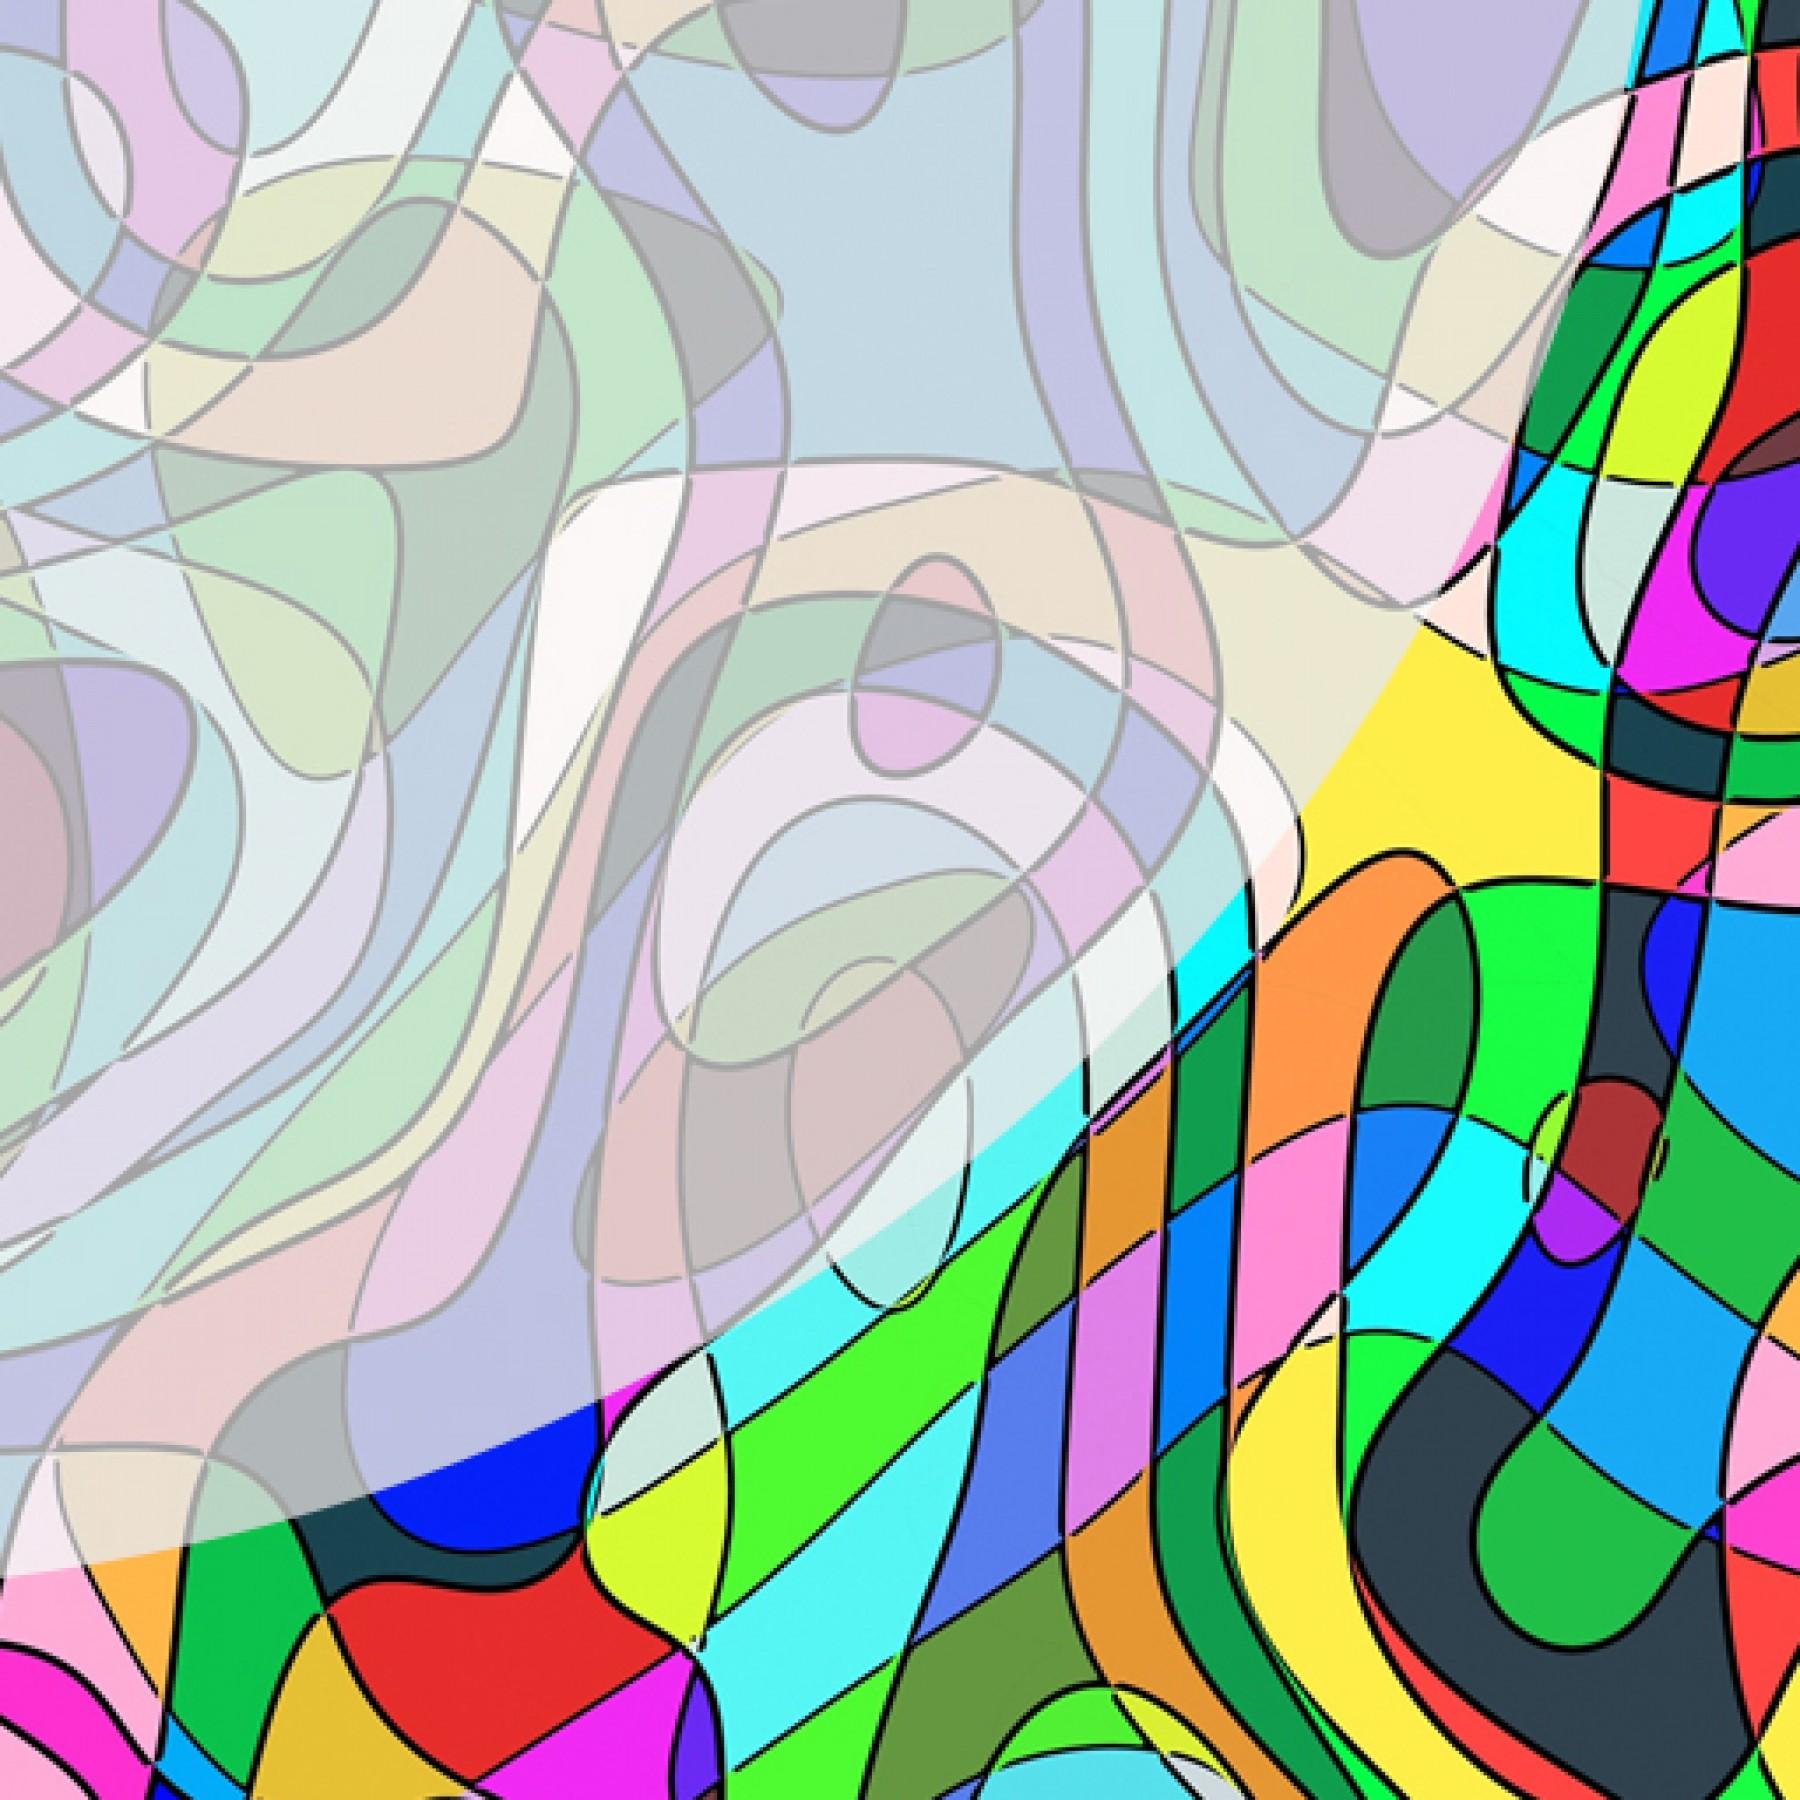 colour-folds-education-quiz-adults-main-location